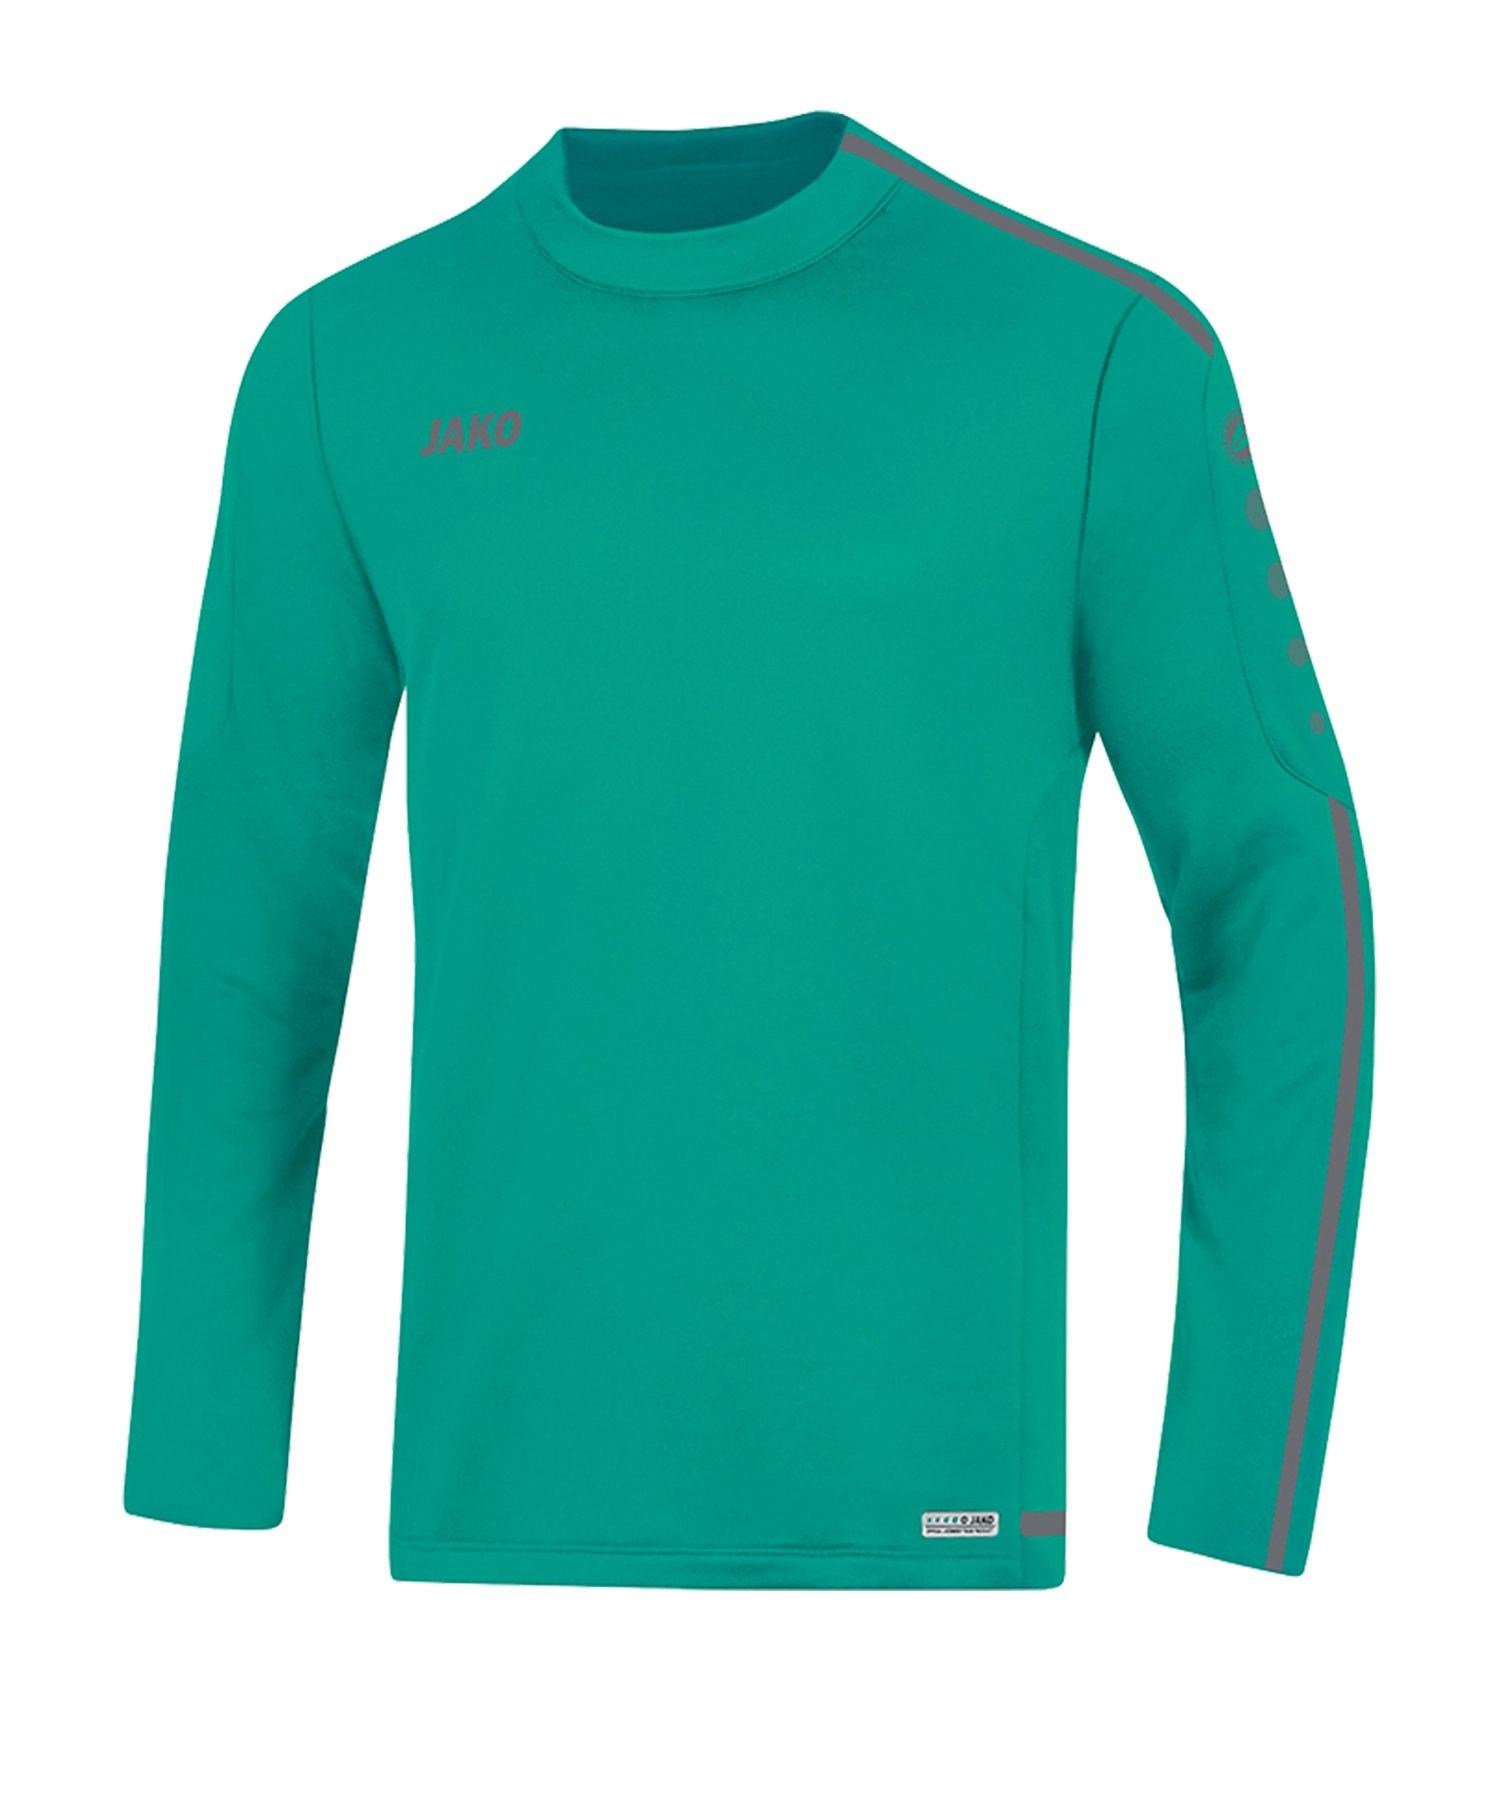 Jako Striker 2.0 Sweatshirt Türkis Grau F24 - Grau